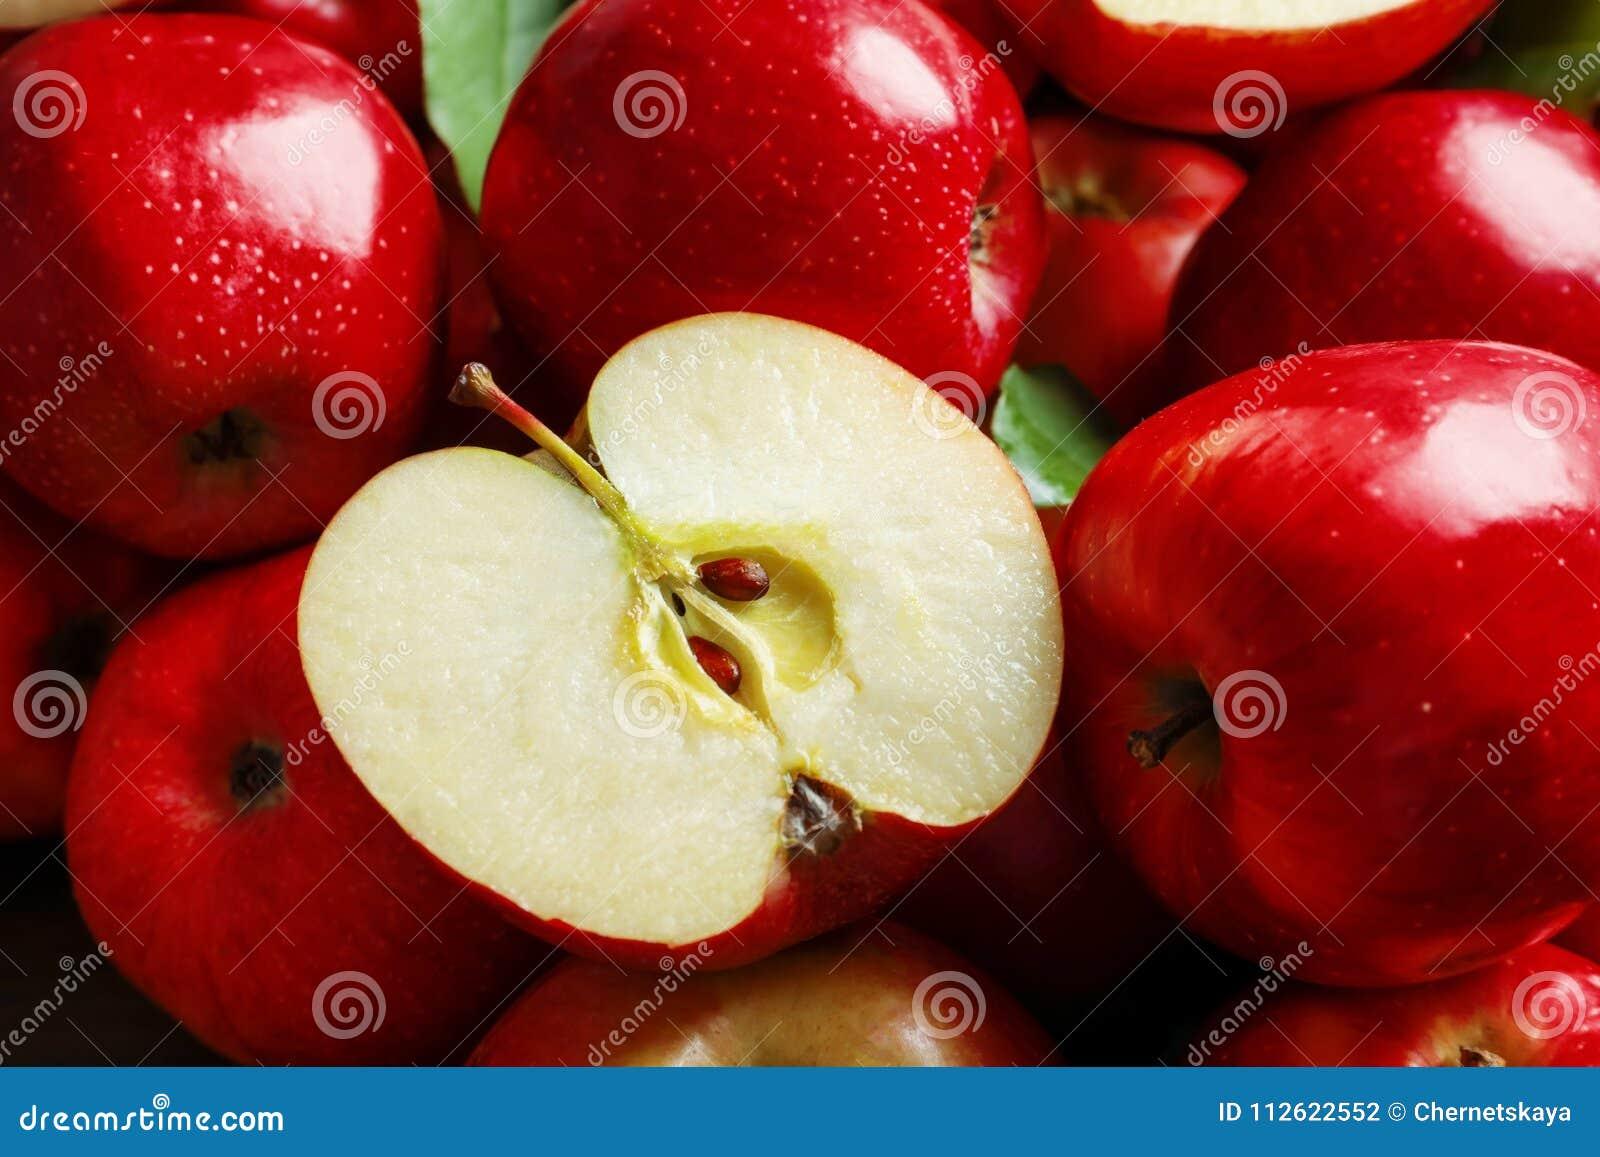 Verse rijpe rode appelen